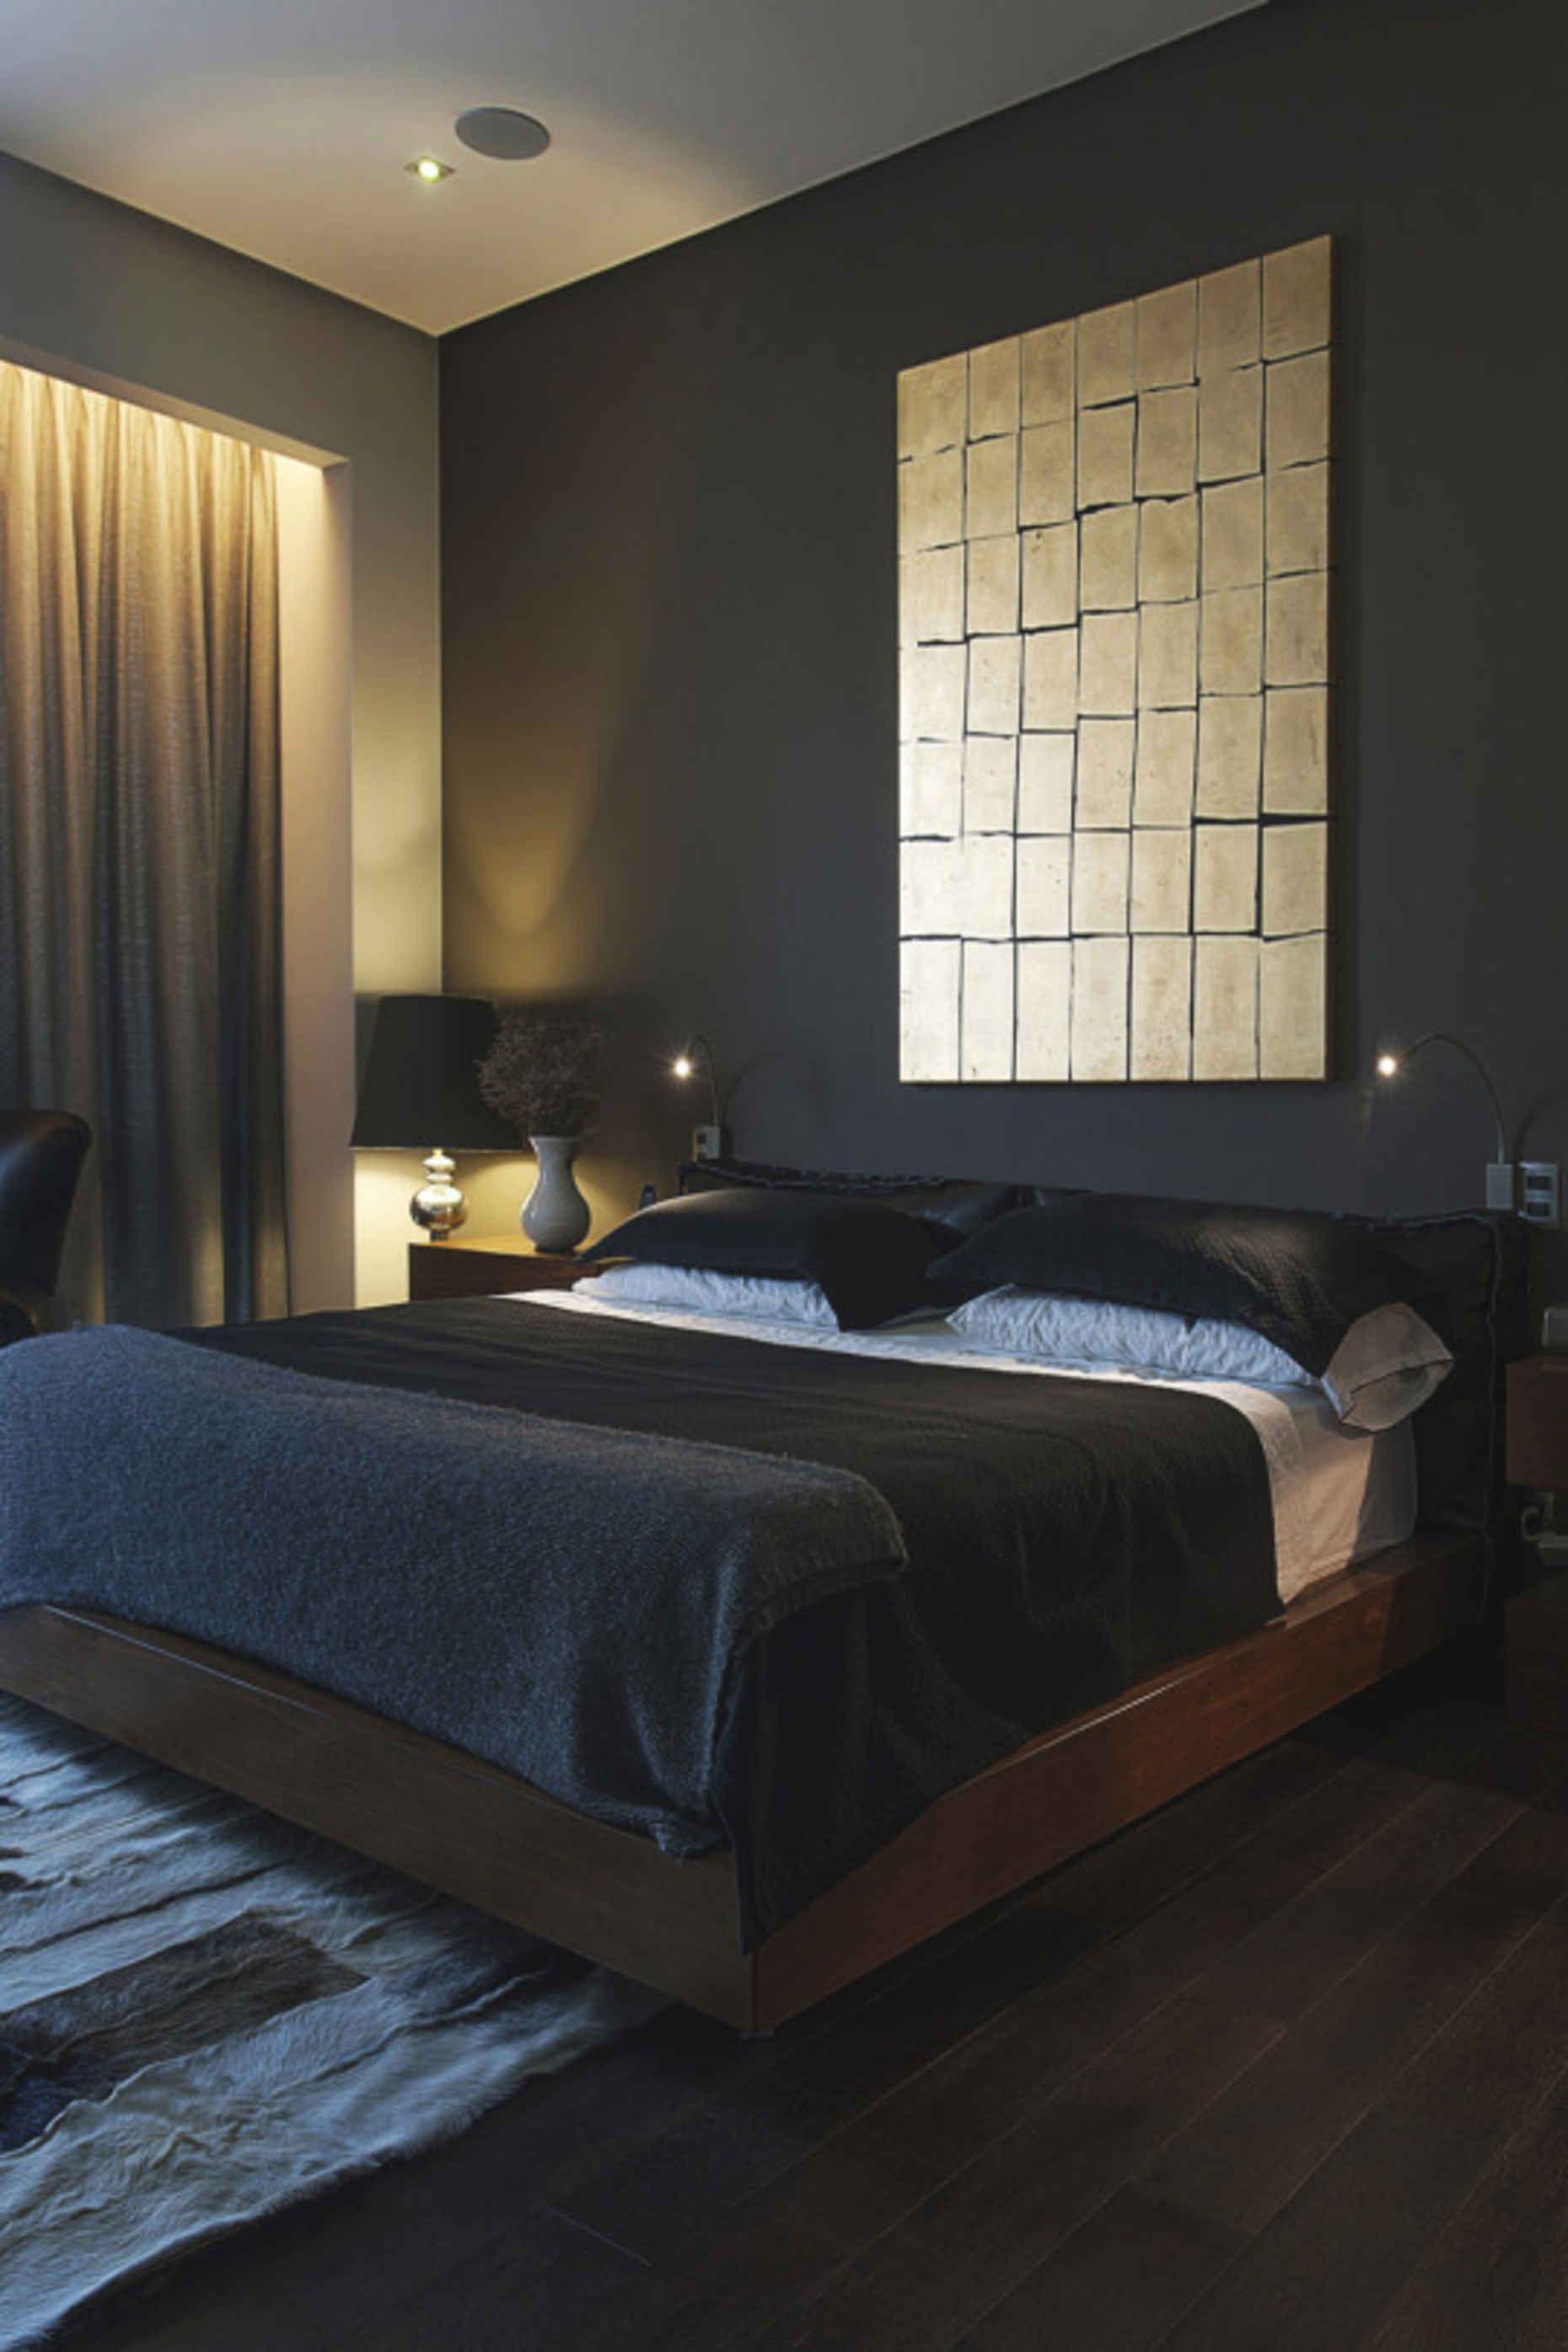 Minimal Interior Design Inspiration Interior Design - Single man bedroom design